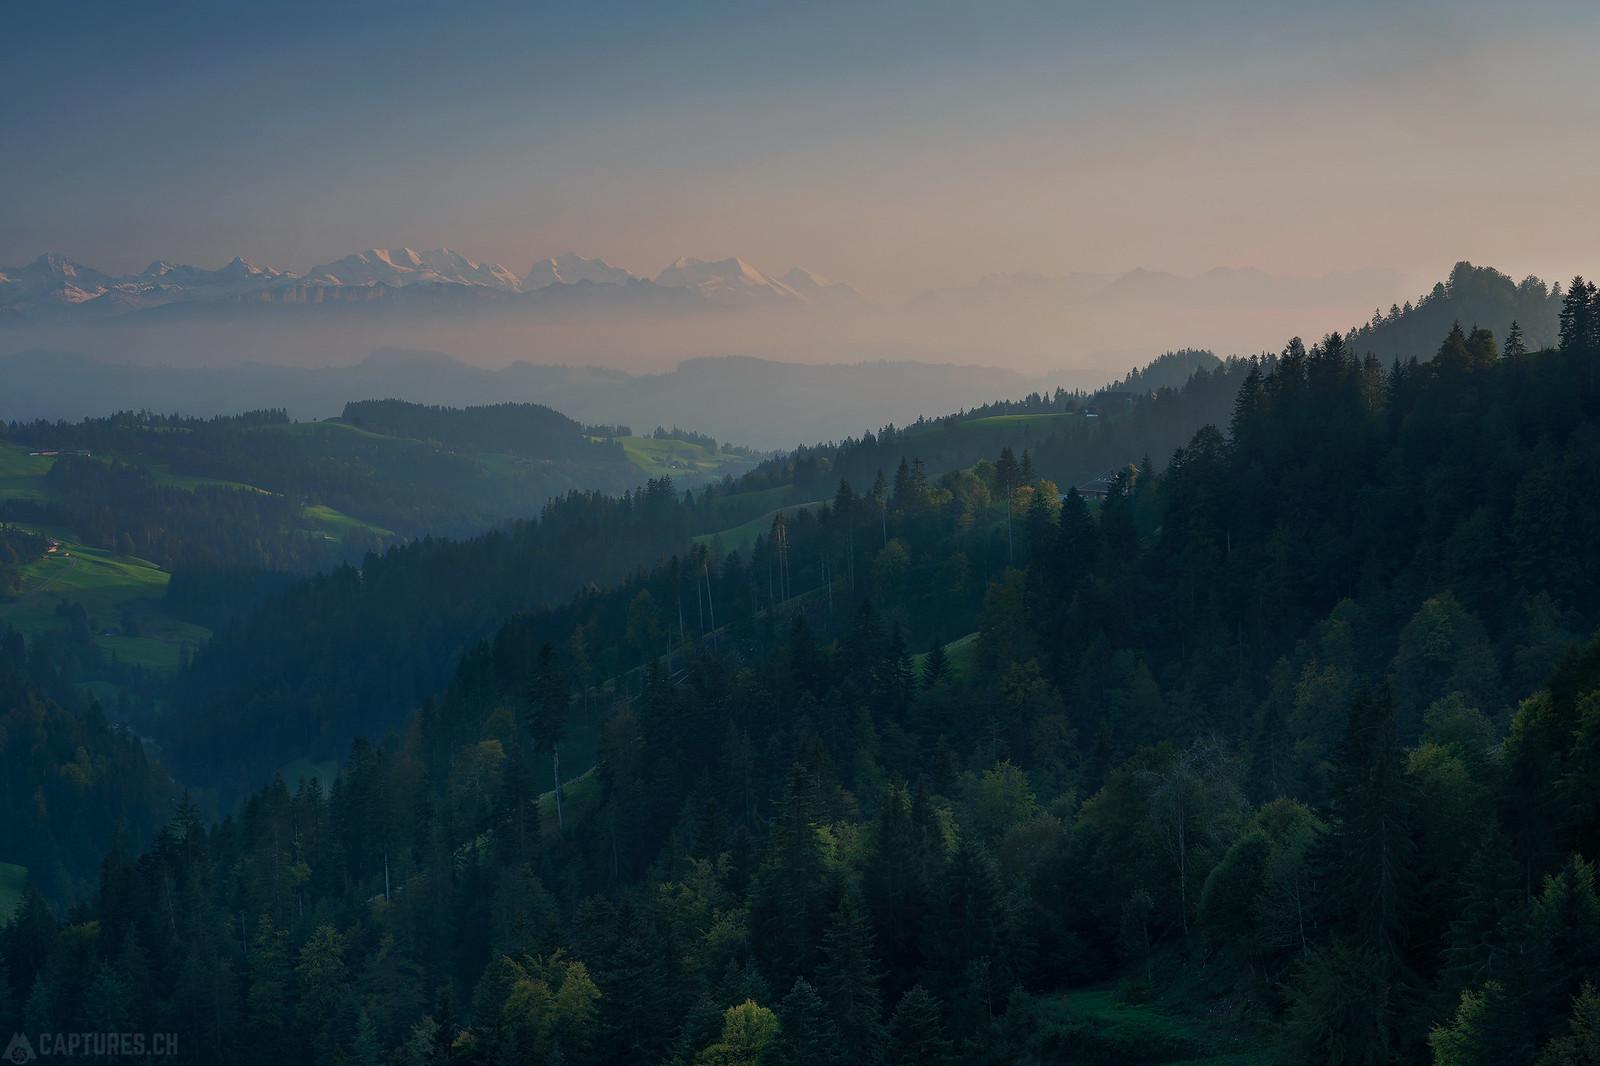 Forest and fog - Lüderenalp